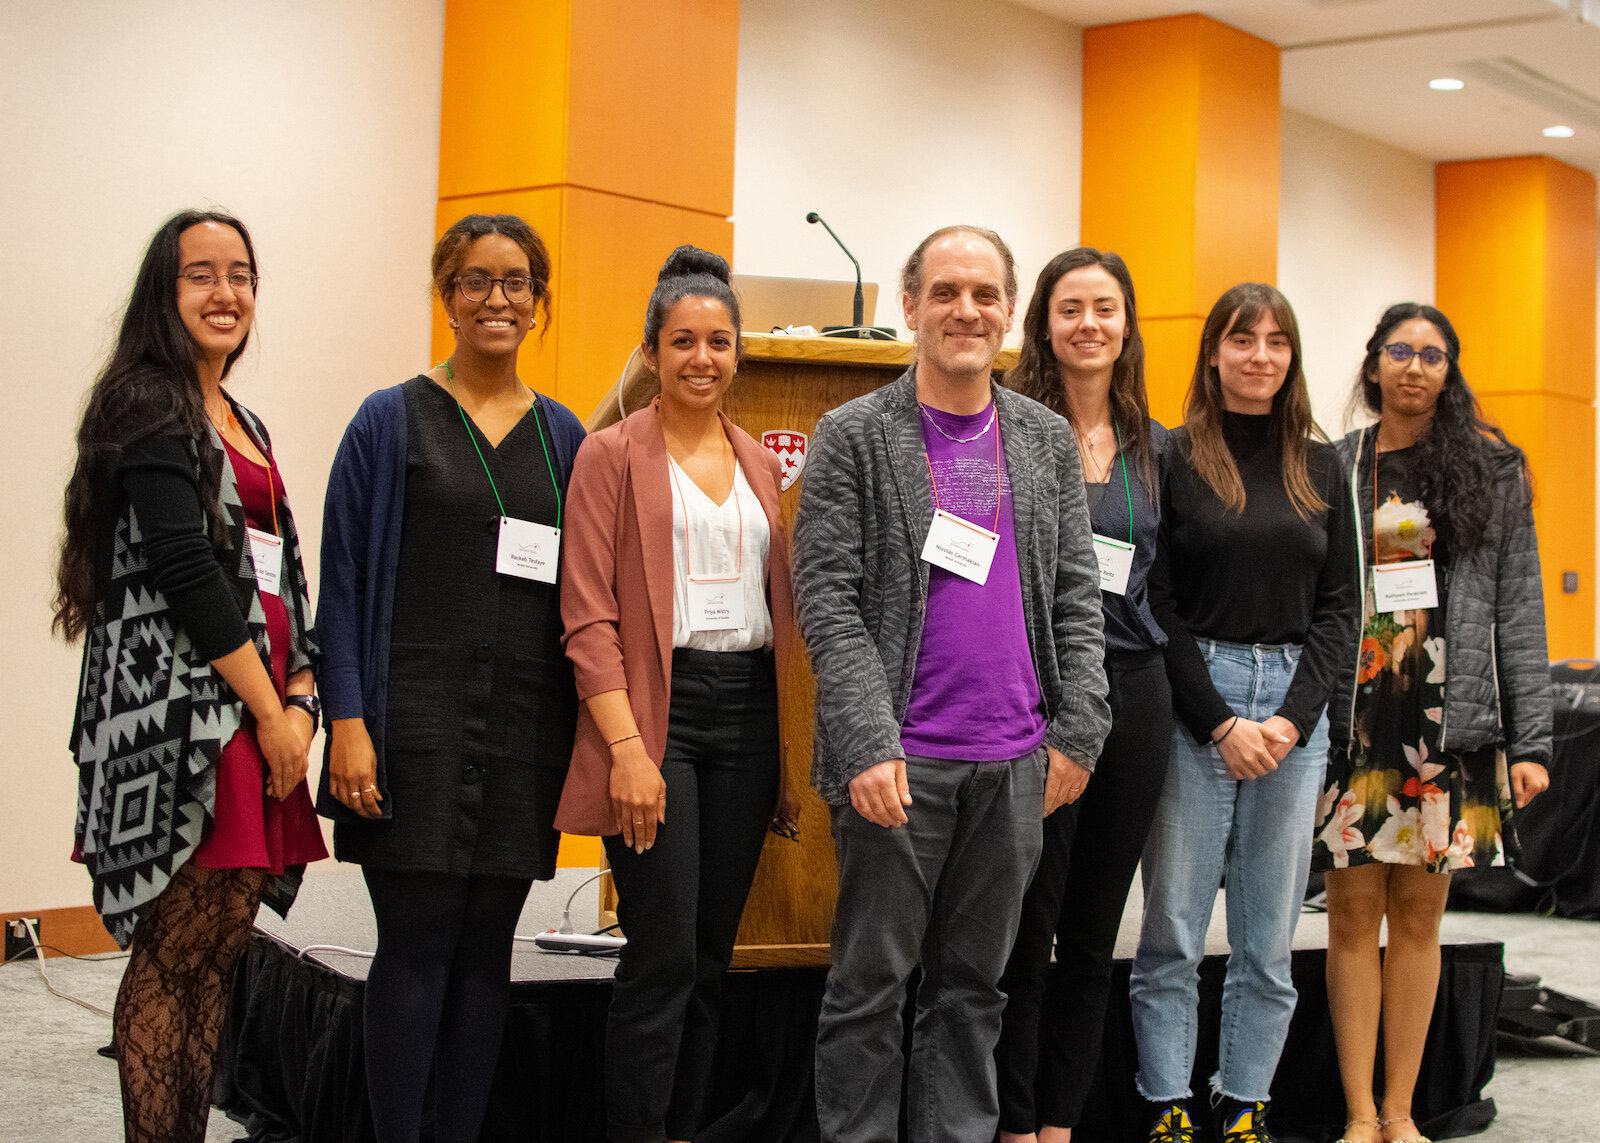 Trainee Merit awardees. From left to right: Hannah de los Santos, Rackeb Tesfaye, Priya Mistry, Nicolas Cermakian, Cristine Reitz, Claire Gizowski, Kathyani Parasram.